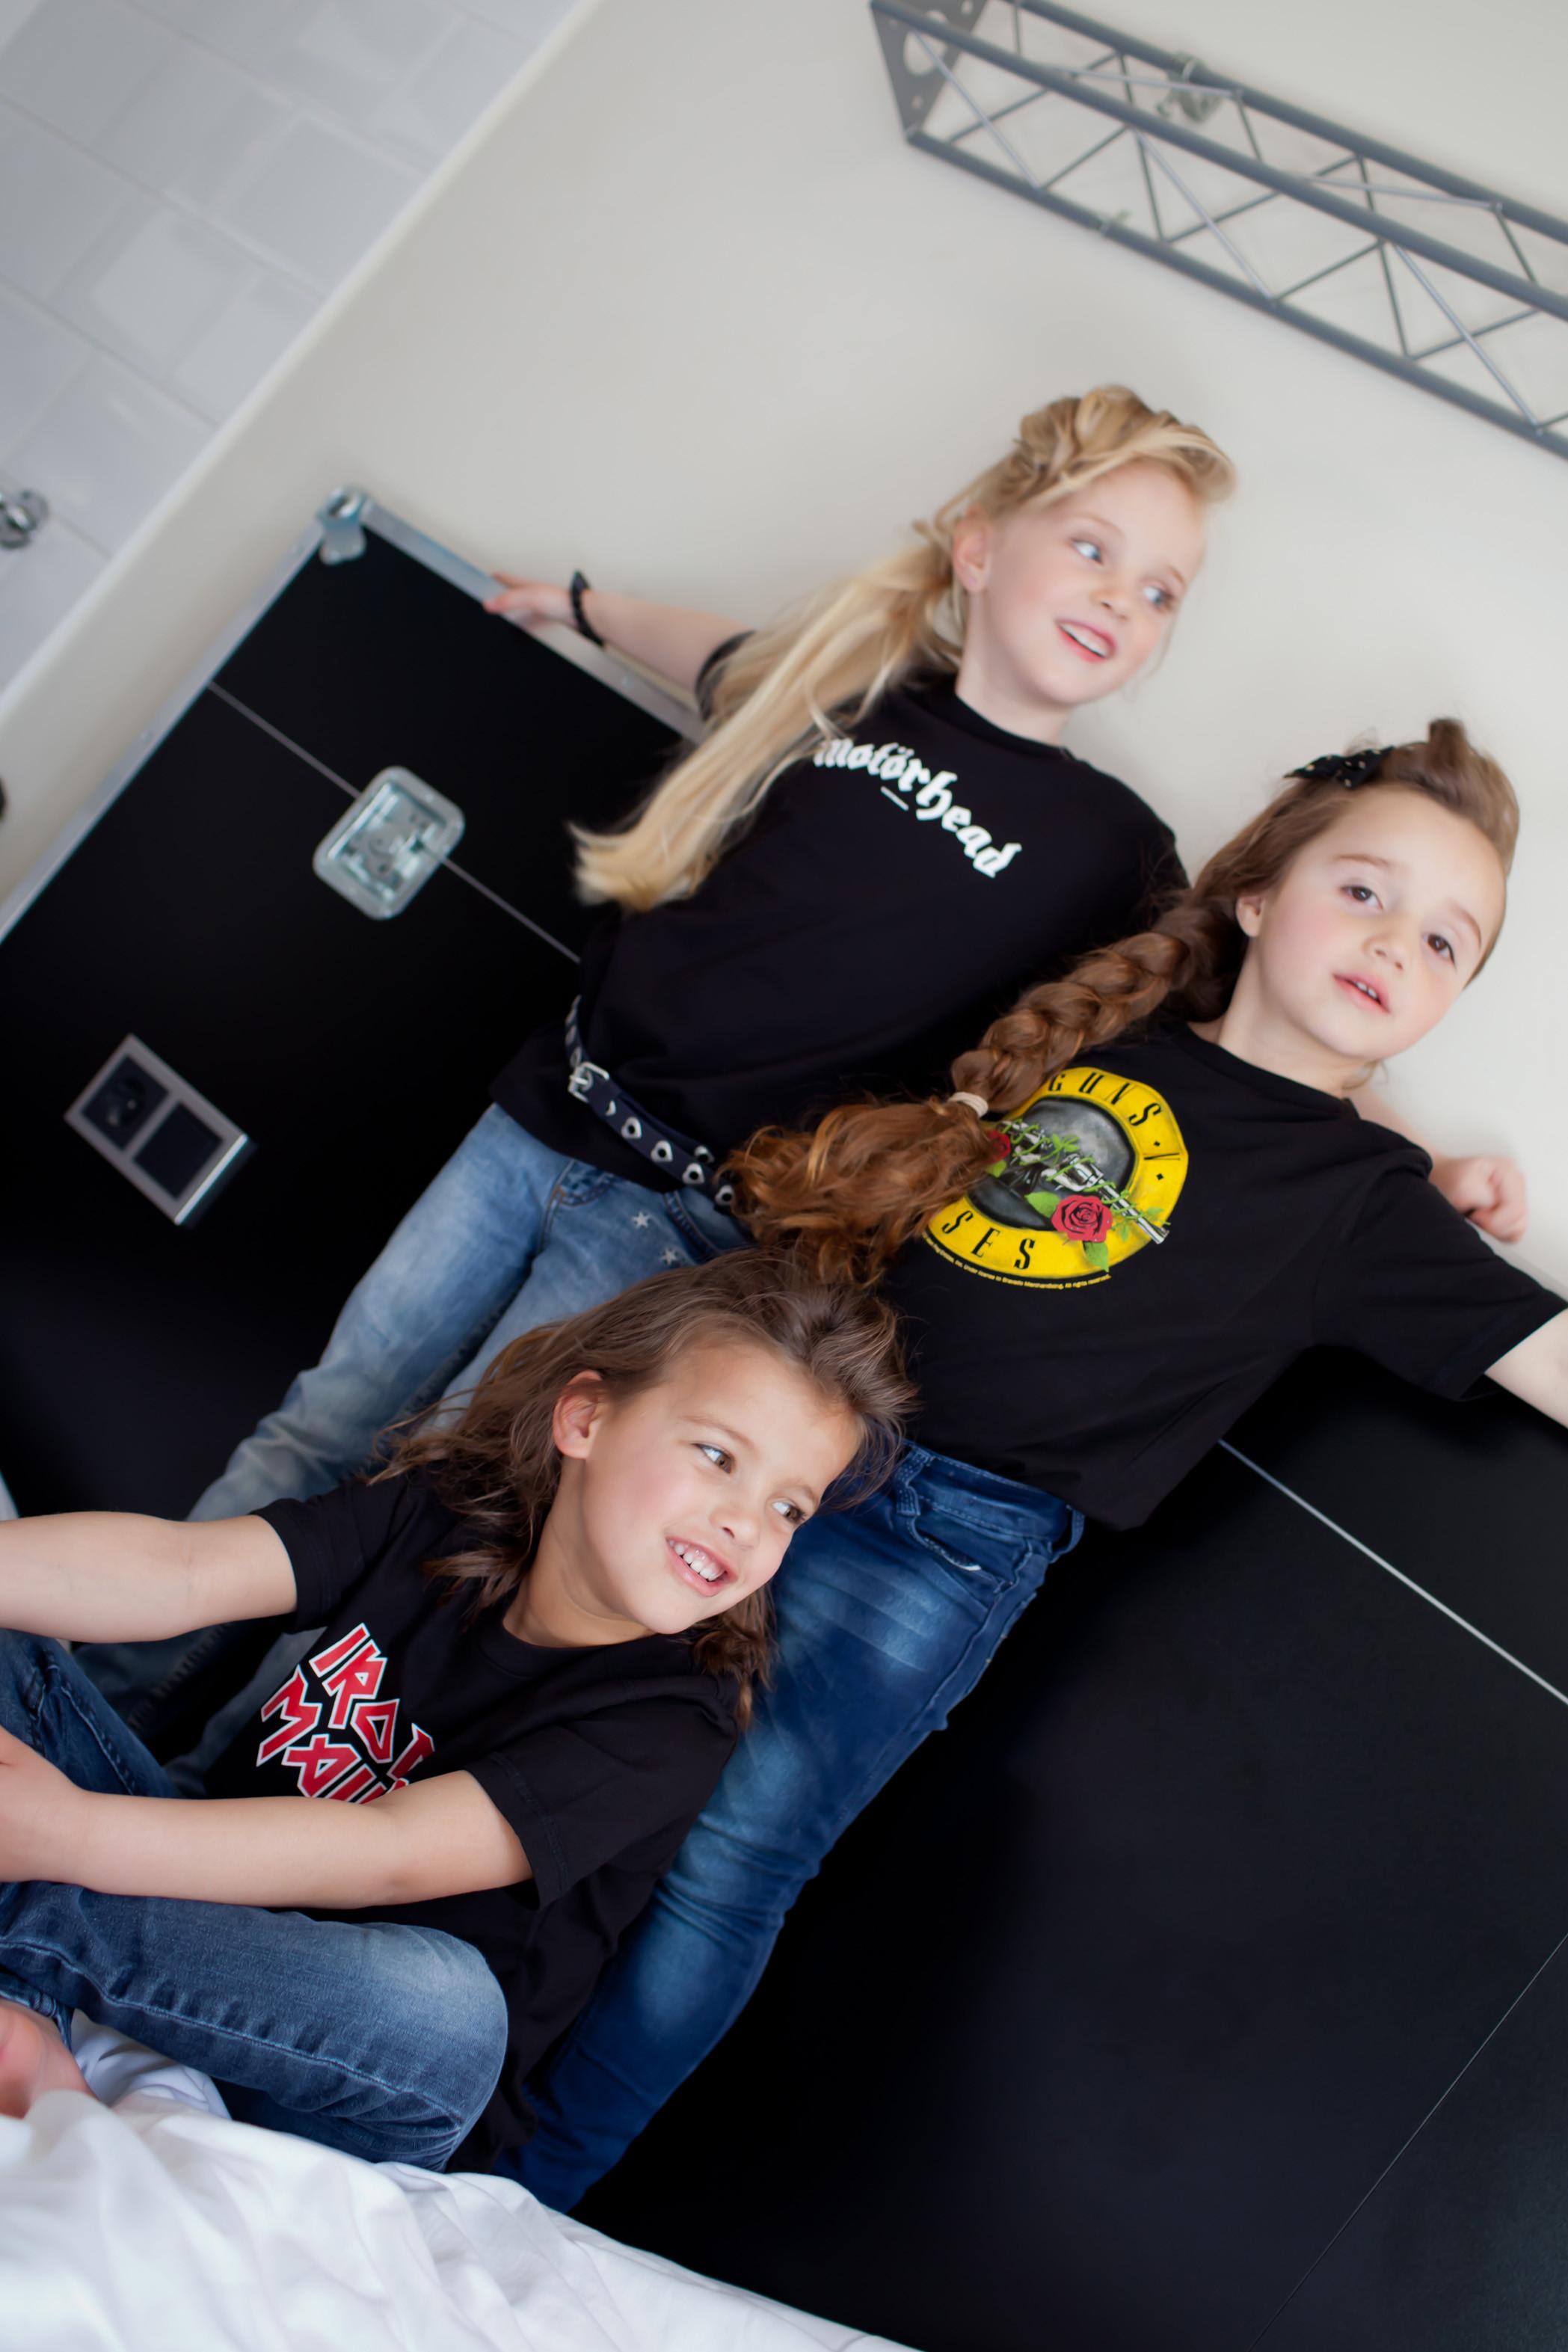 Iron Maiden kinder t-shirt group 3 girls